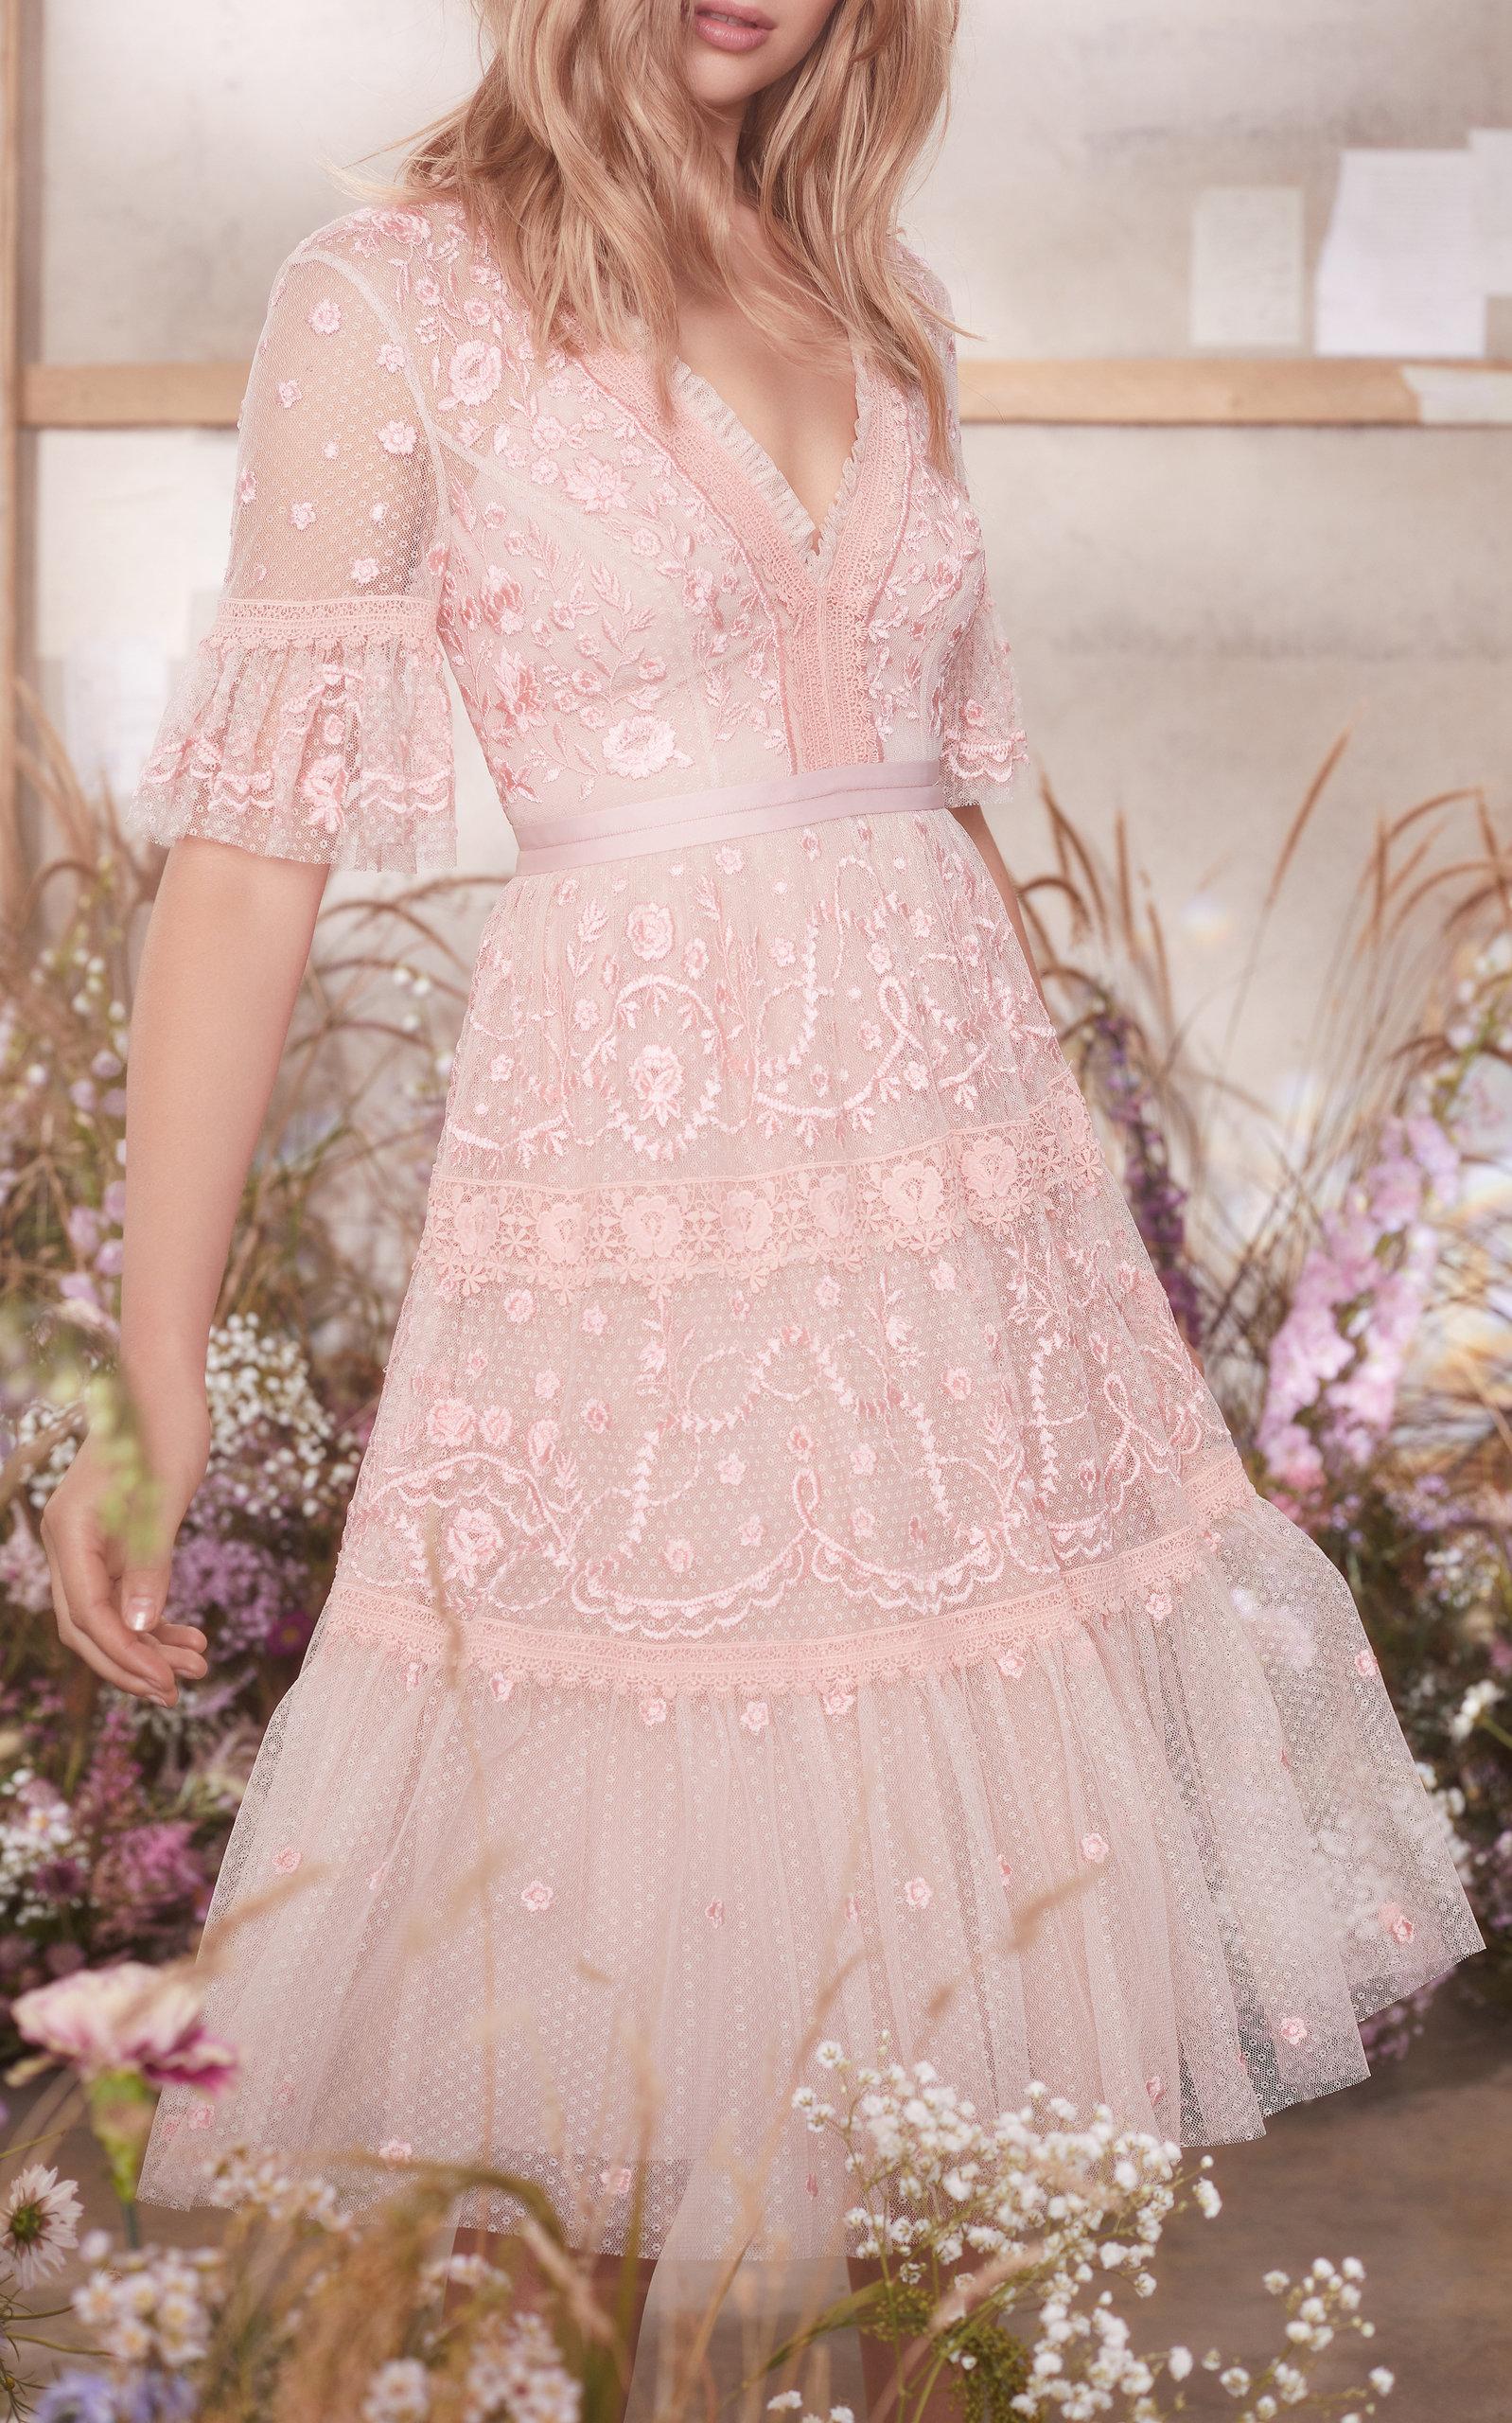 a3f1bb50d2ea Midsummer lace dress by Needle & Thread | Moda Operandi